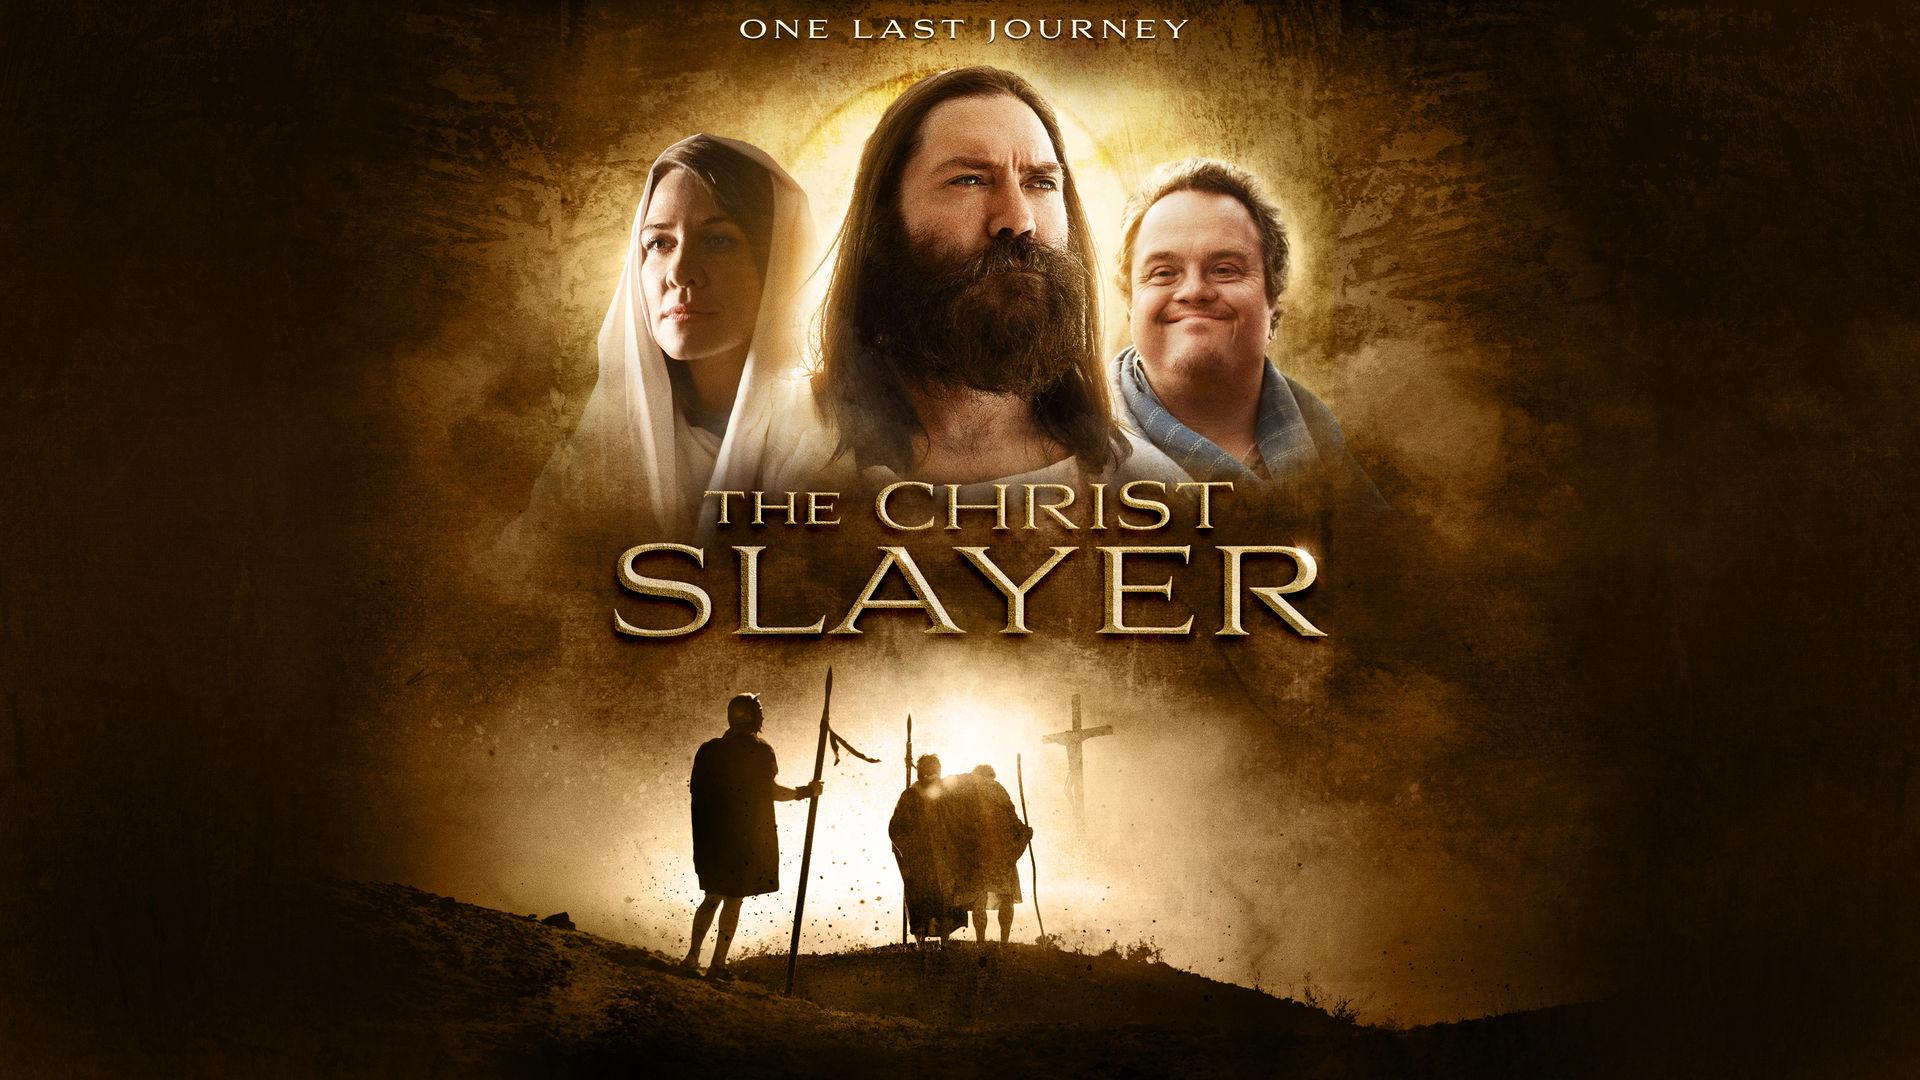 The Christ Slayer